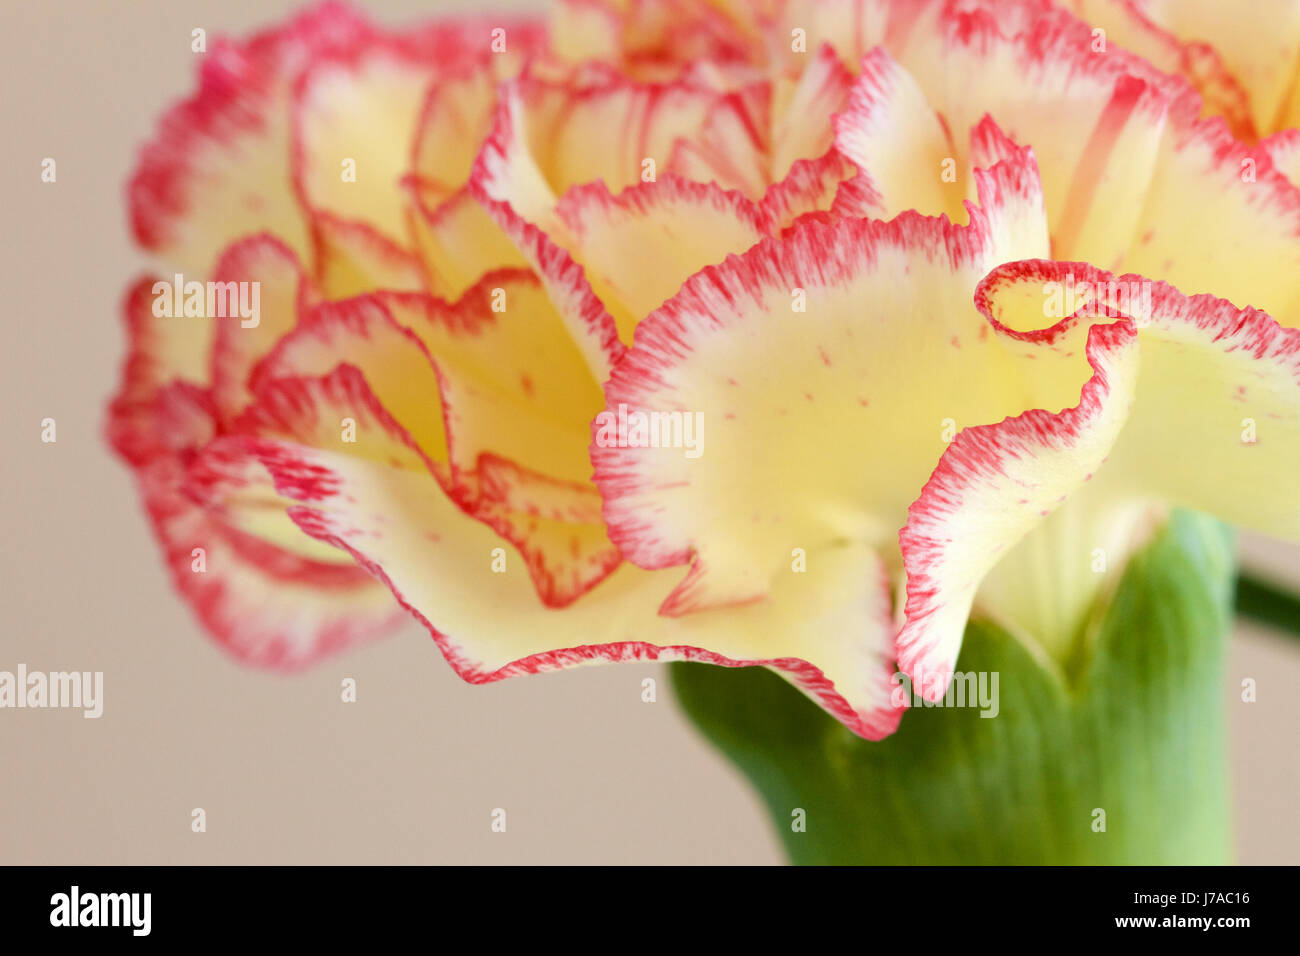 Yellow And Pink Carnation Flower Macro Shot Stock Photo 142214498